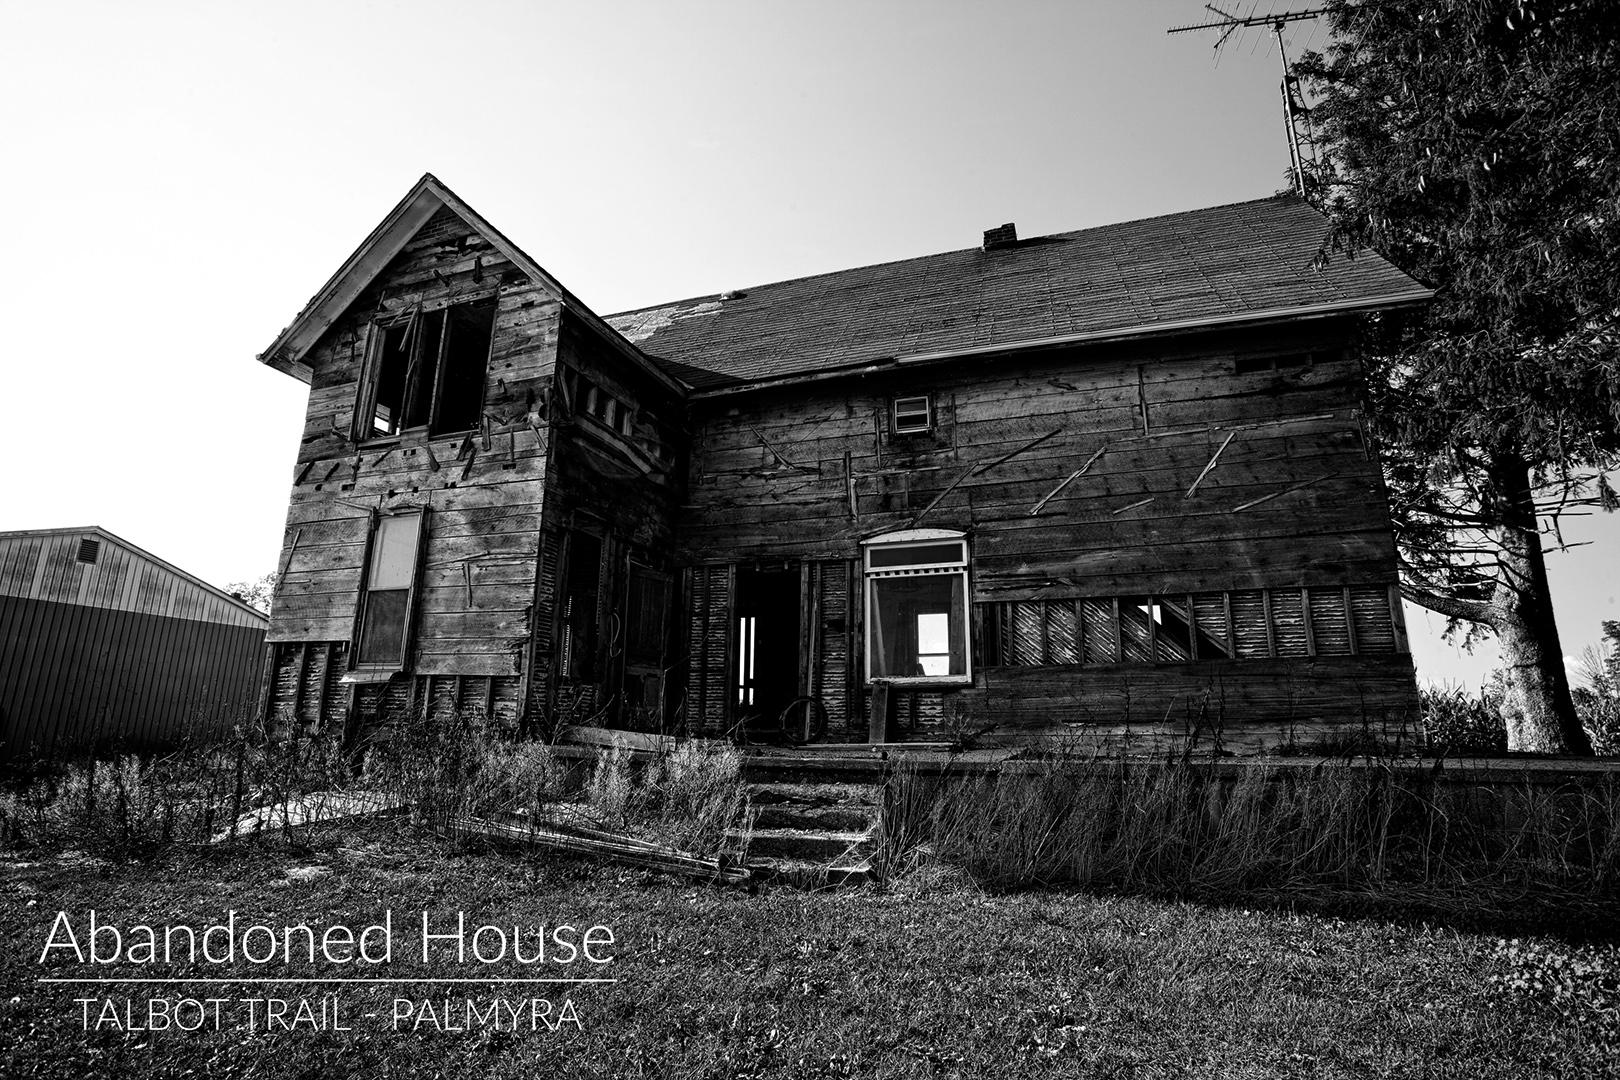 Abandoned House - Talbot Trail - Palmyra, ON